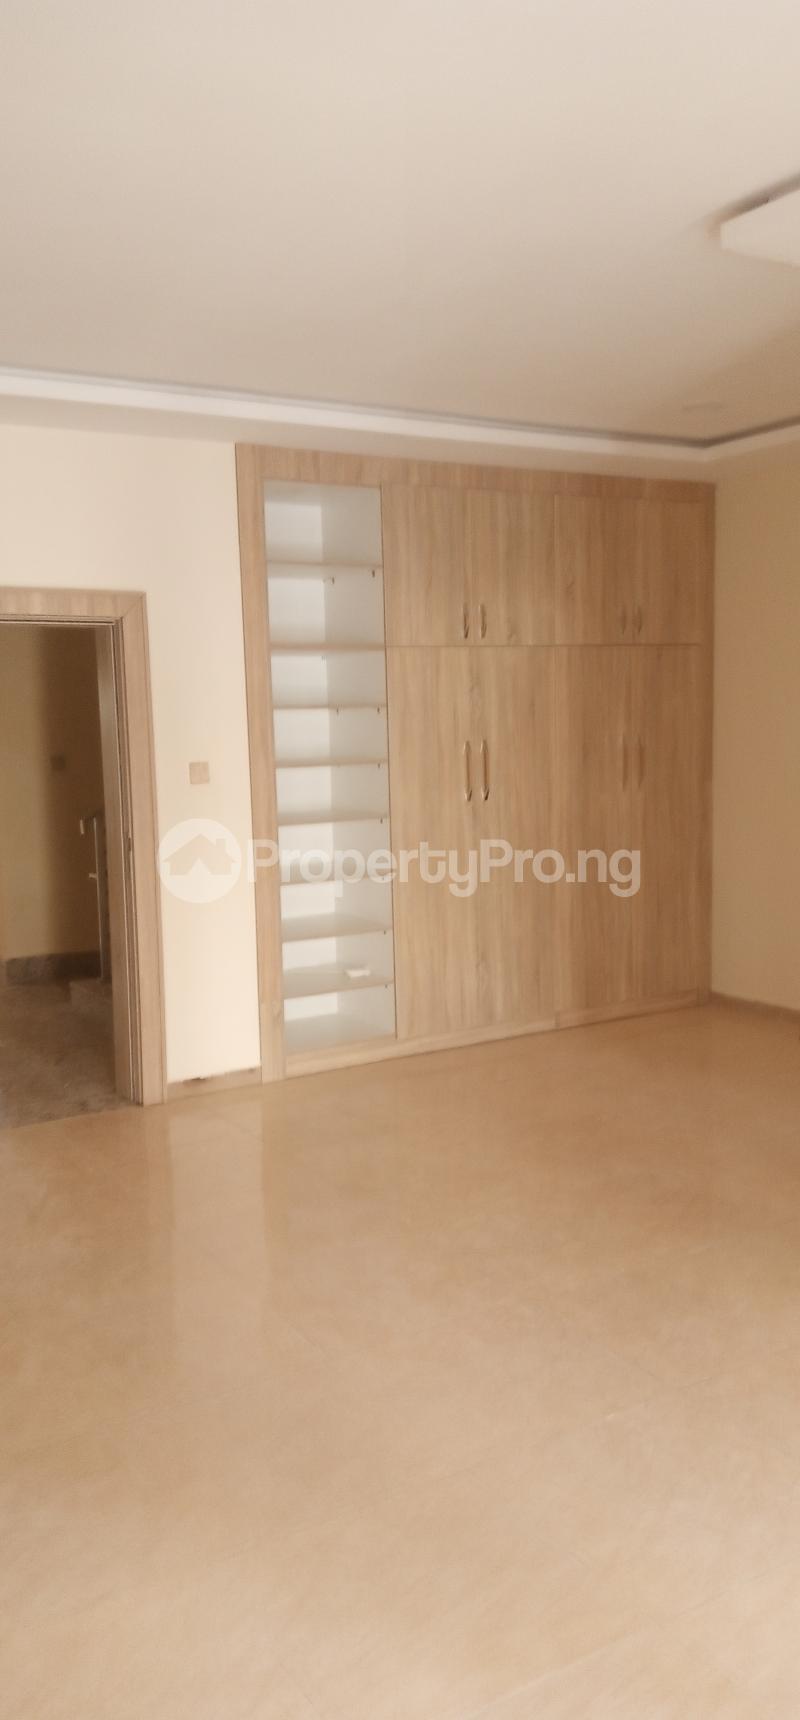 4 bedroom Terraced Duplex House for sale Wuye Abuja - 2